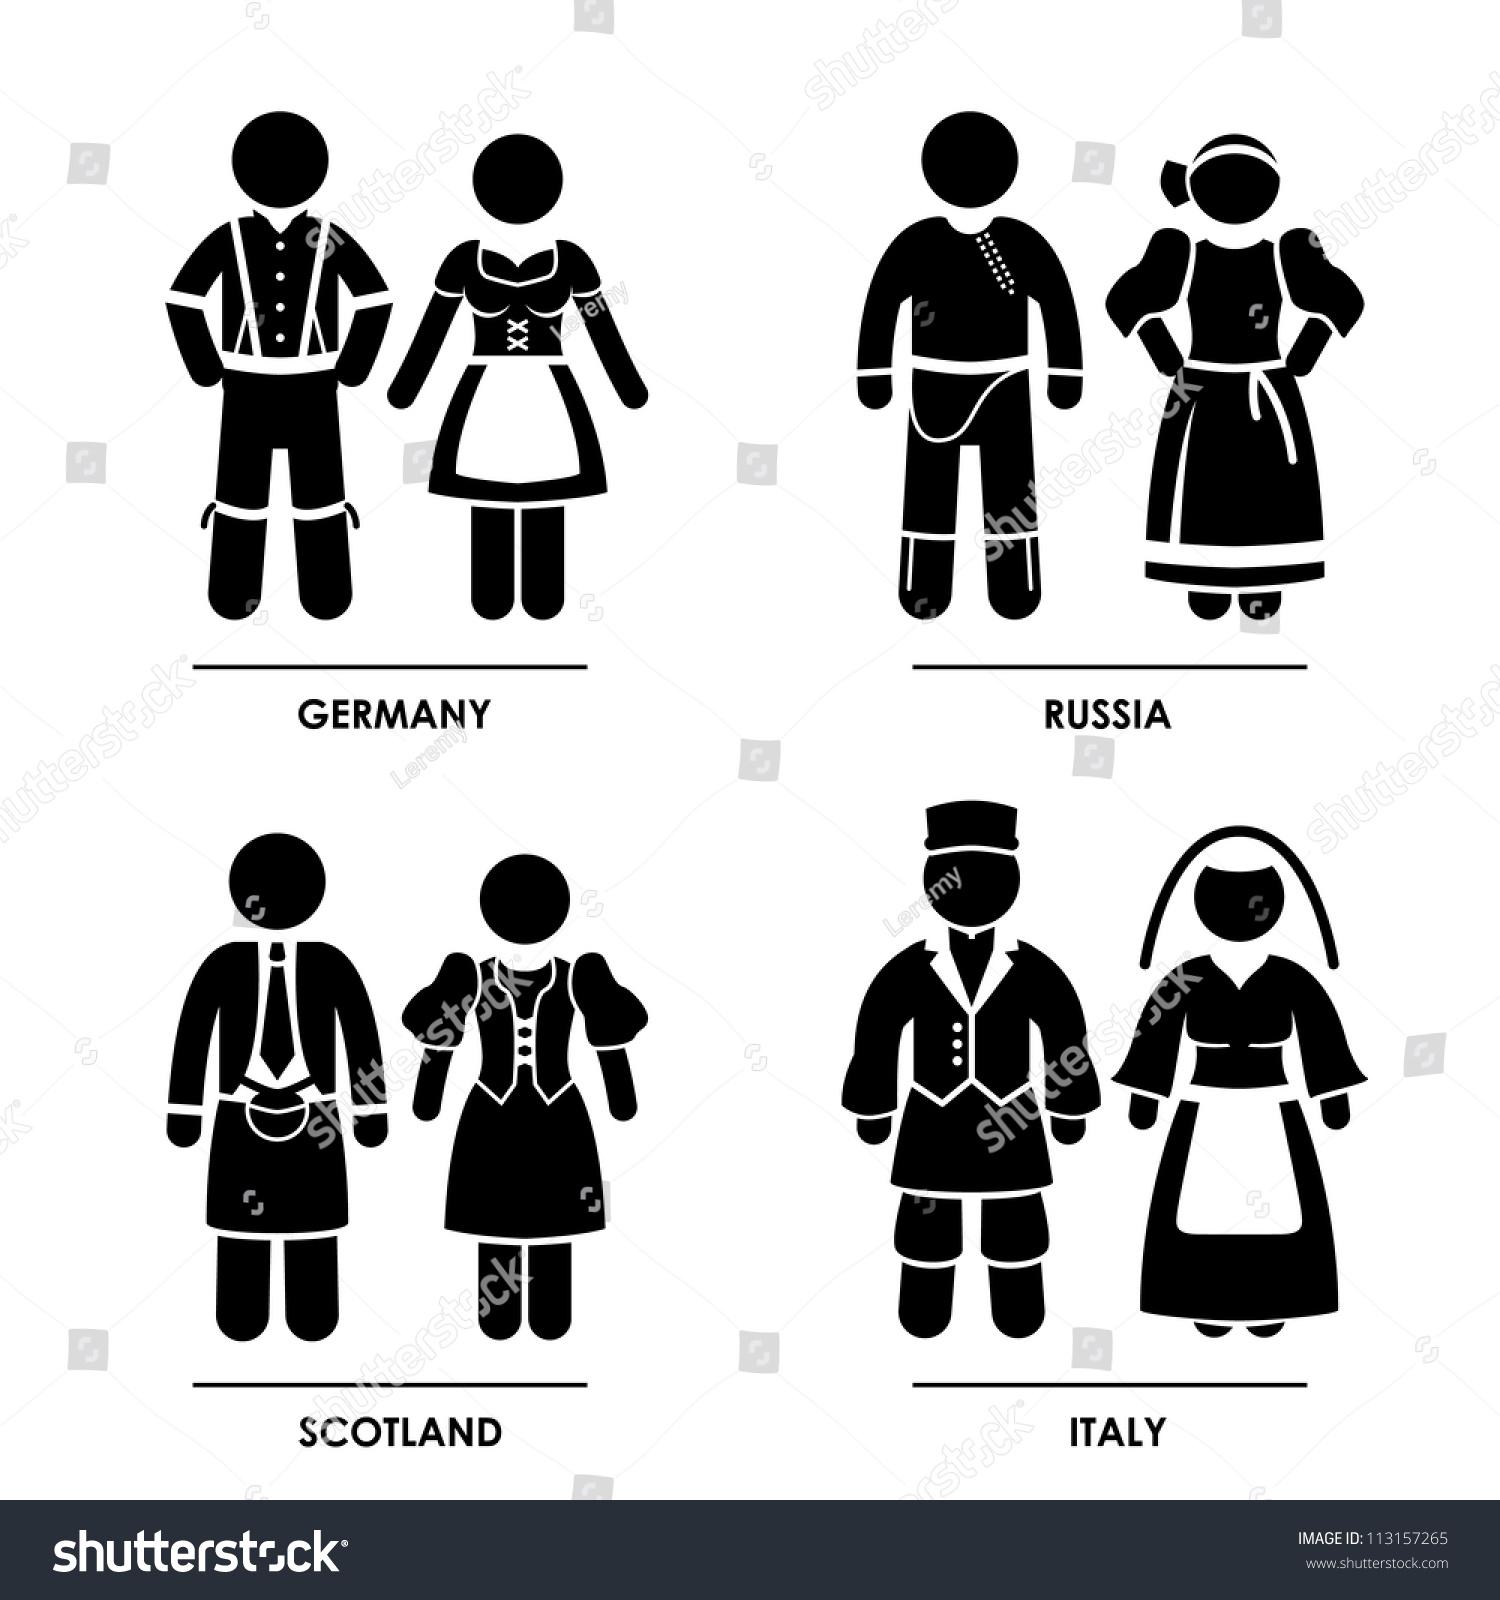 Royalty Free Europe Germany Russia Scotland Italy 113157265